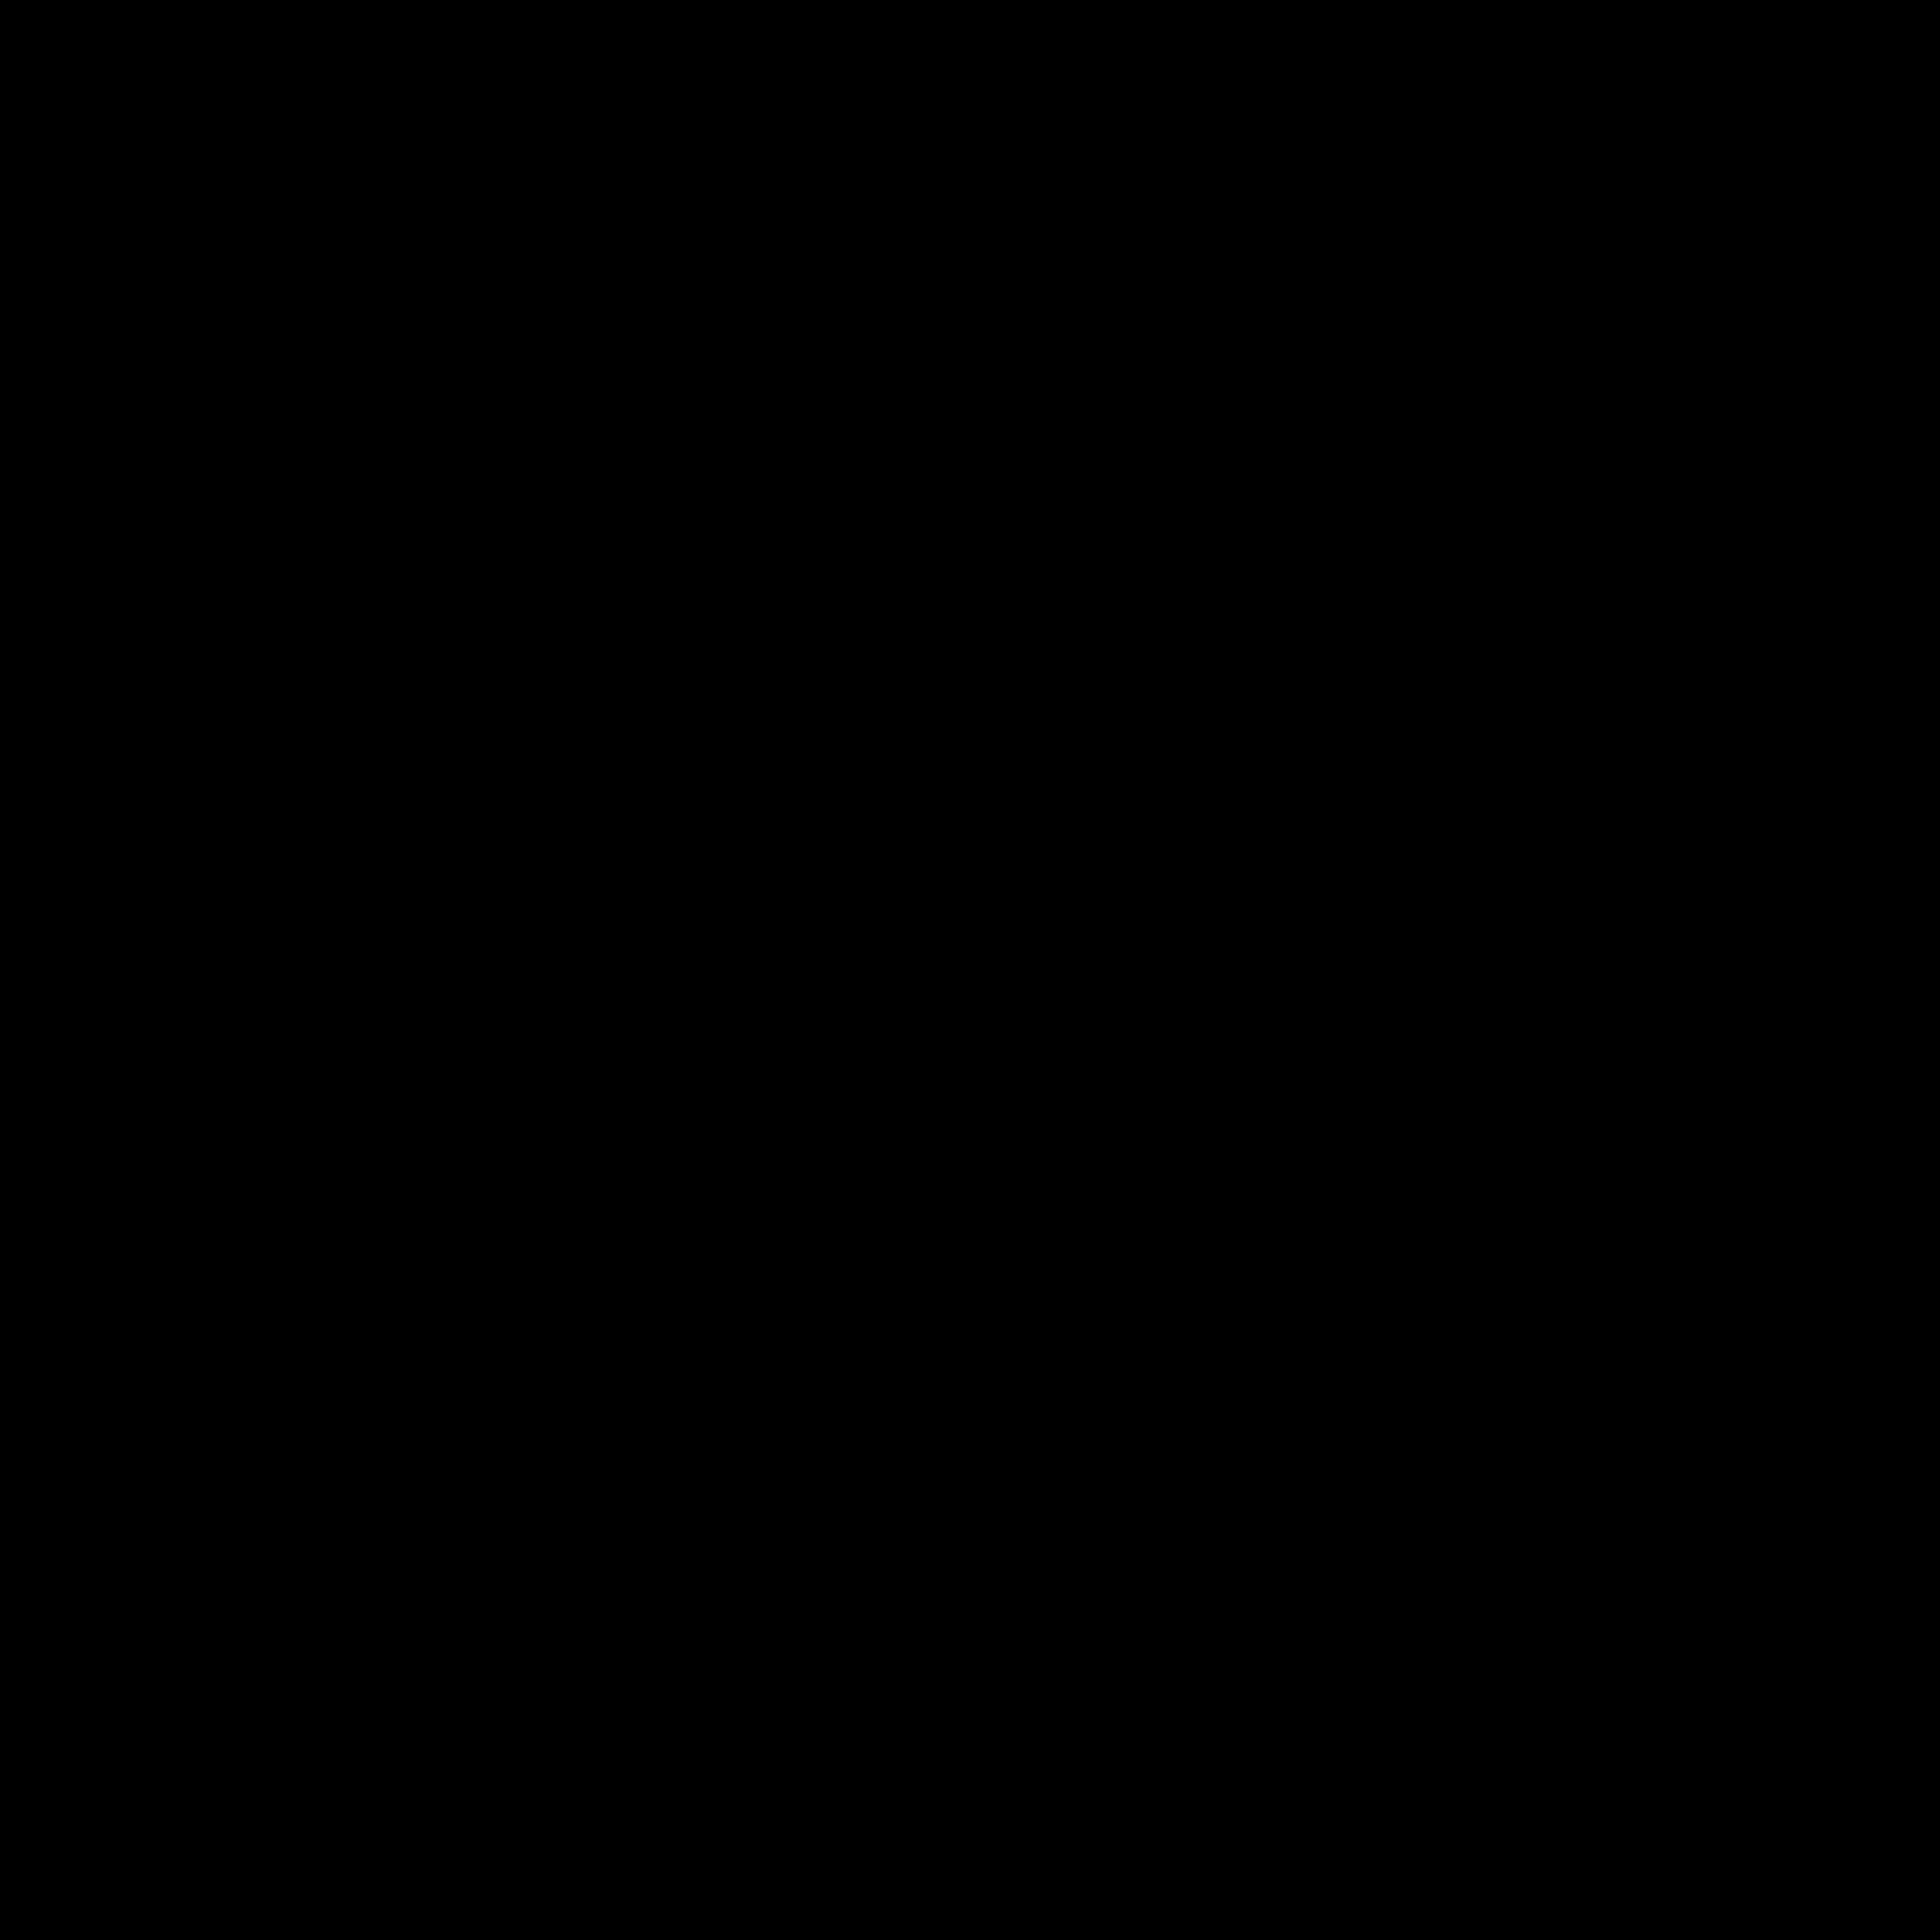 14 Icon Sync Black.png Transparent Images.